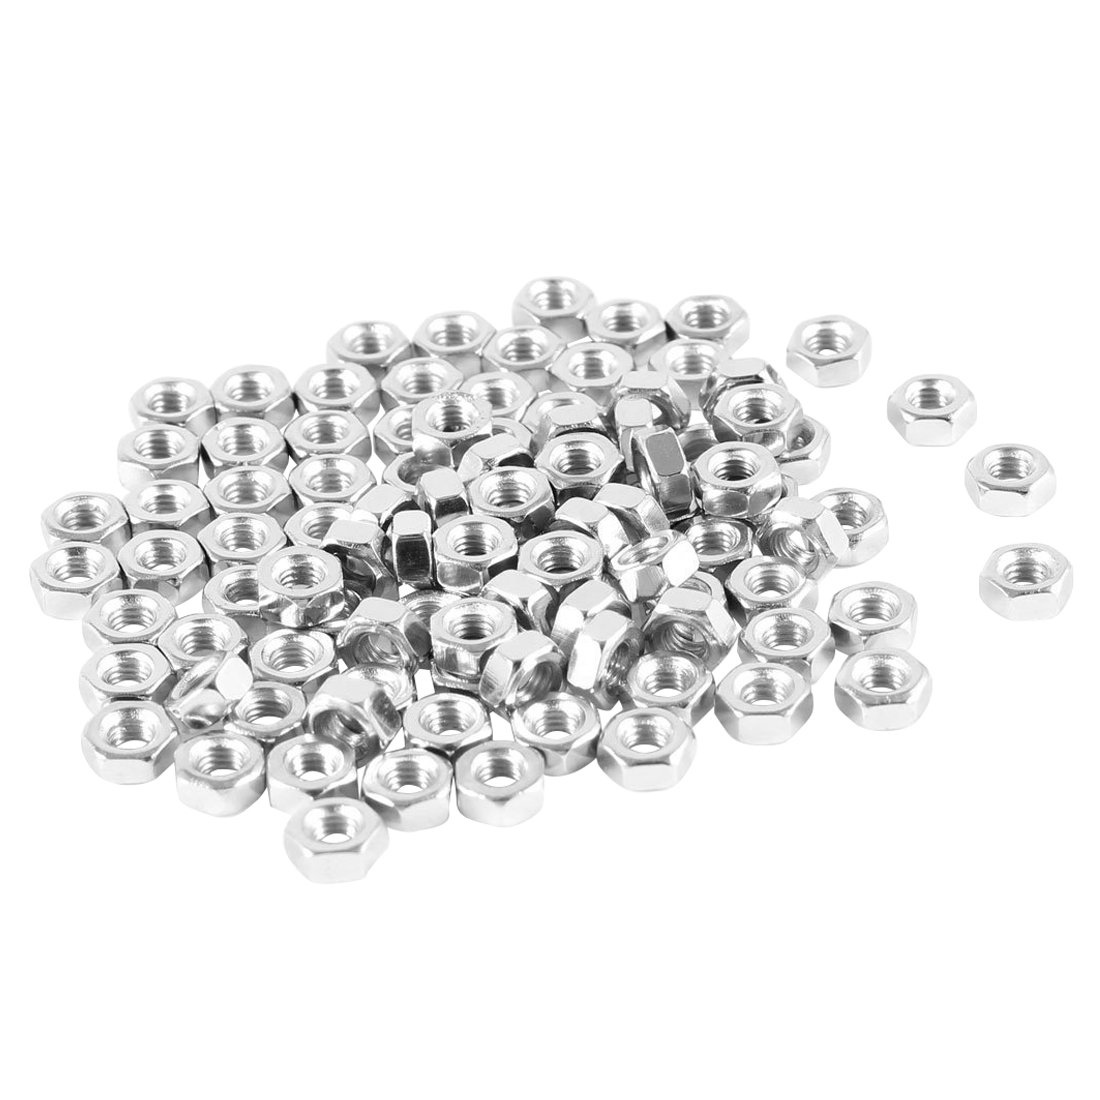 Ecrou hexagonal - SODIAL(R) 100Pcs M3 Ecrou femelle 3mm Ecrou hexagonal Ecrou argente